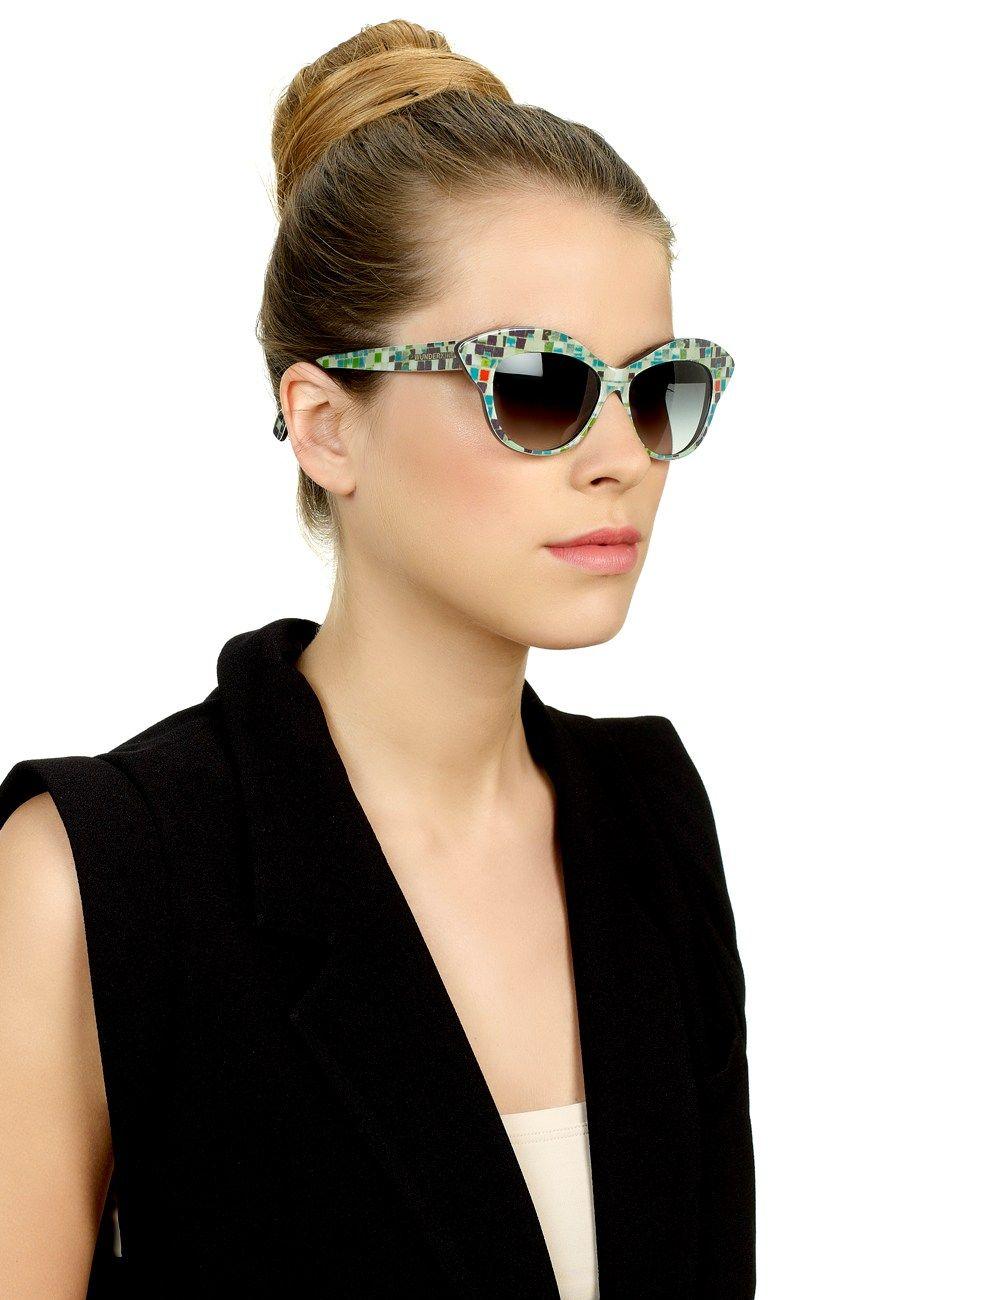 c9b51228fd0e Mosaic Cat-Eye Sunglasses | Wunderkind Turquoise Mosaic Cat-Eye Sunglasses  by Wolfgang Joop | Avenue32